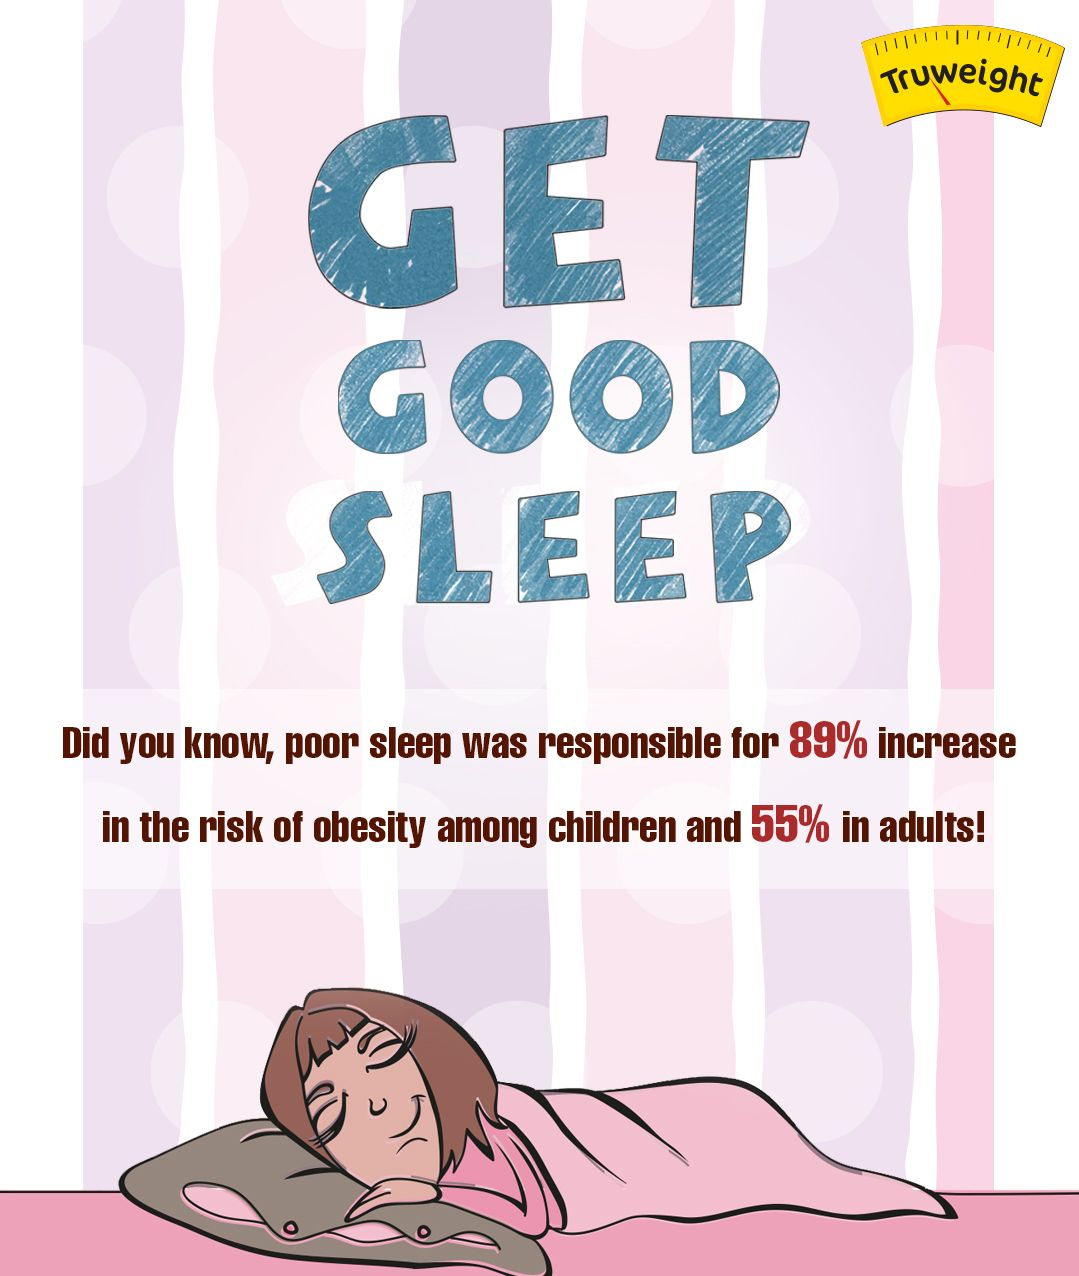 55% of the adults wish they knew this info!!! Sleep you way to weight loss! #getgoodsleep#beautysleep #twthealthtips